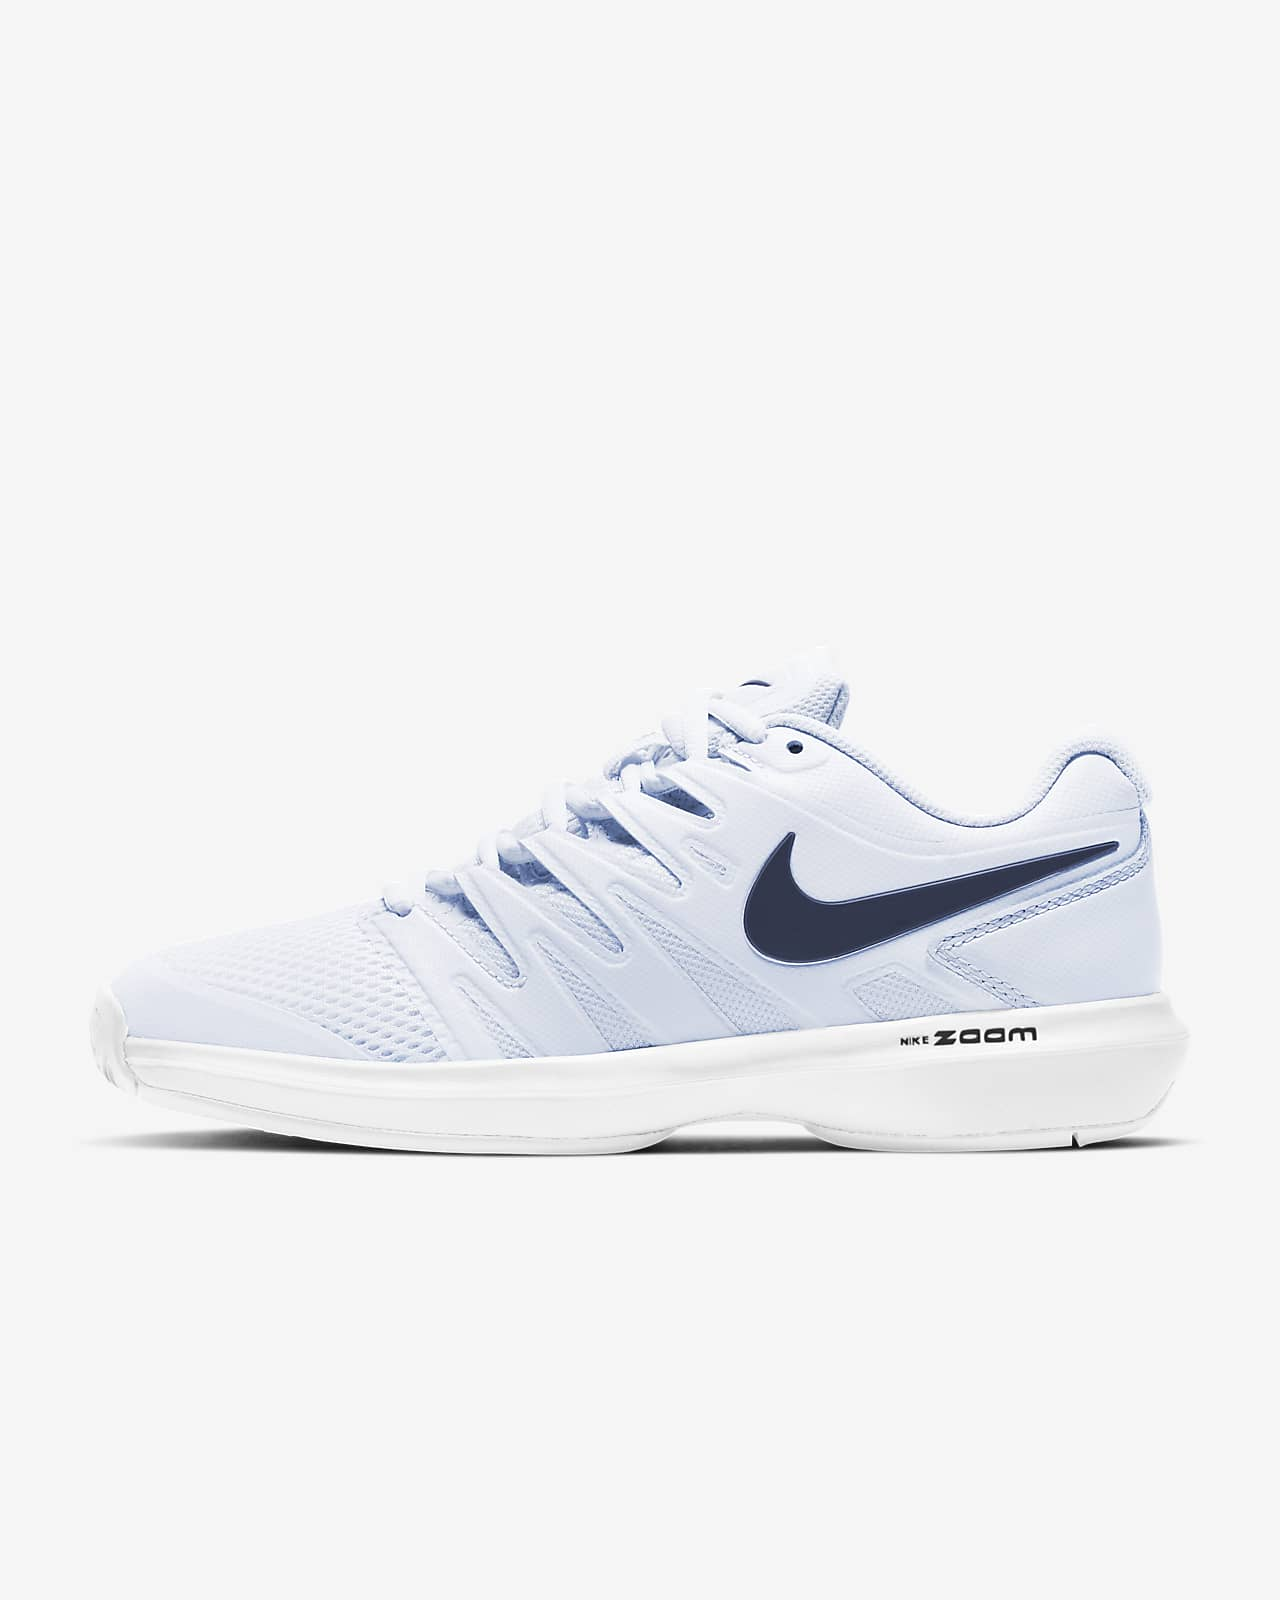 chaussures tennis nike zoom